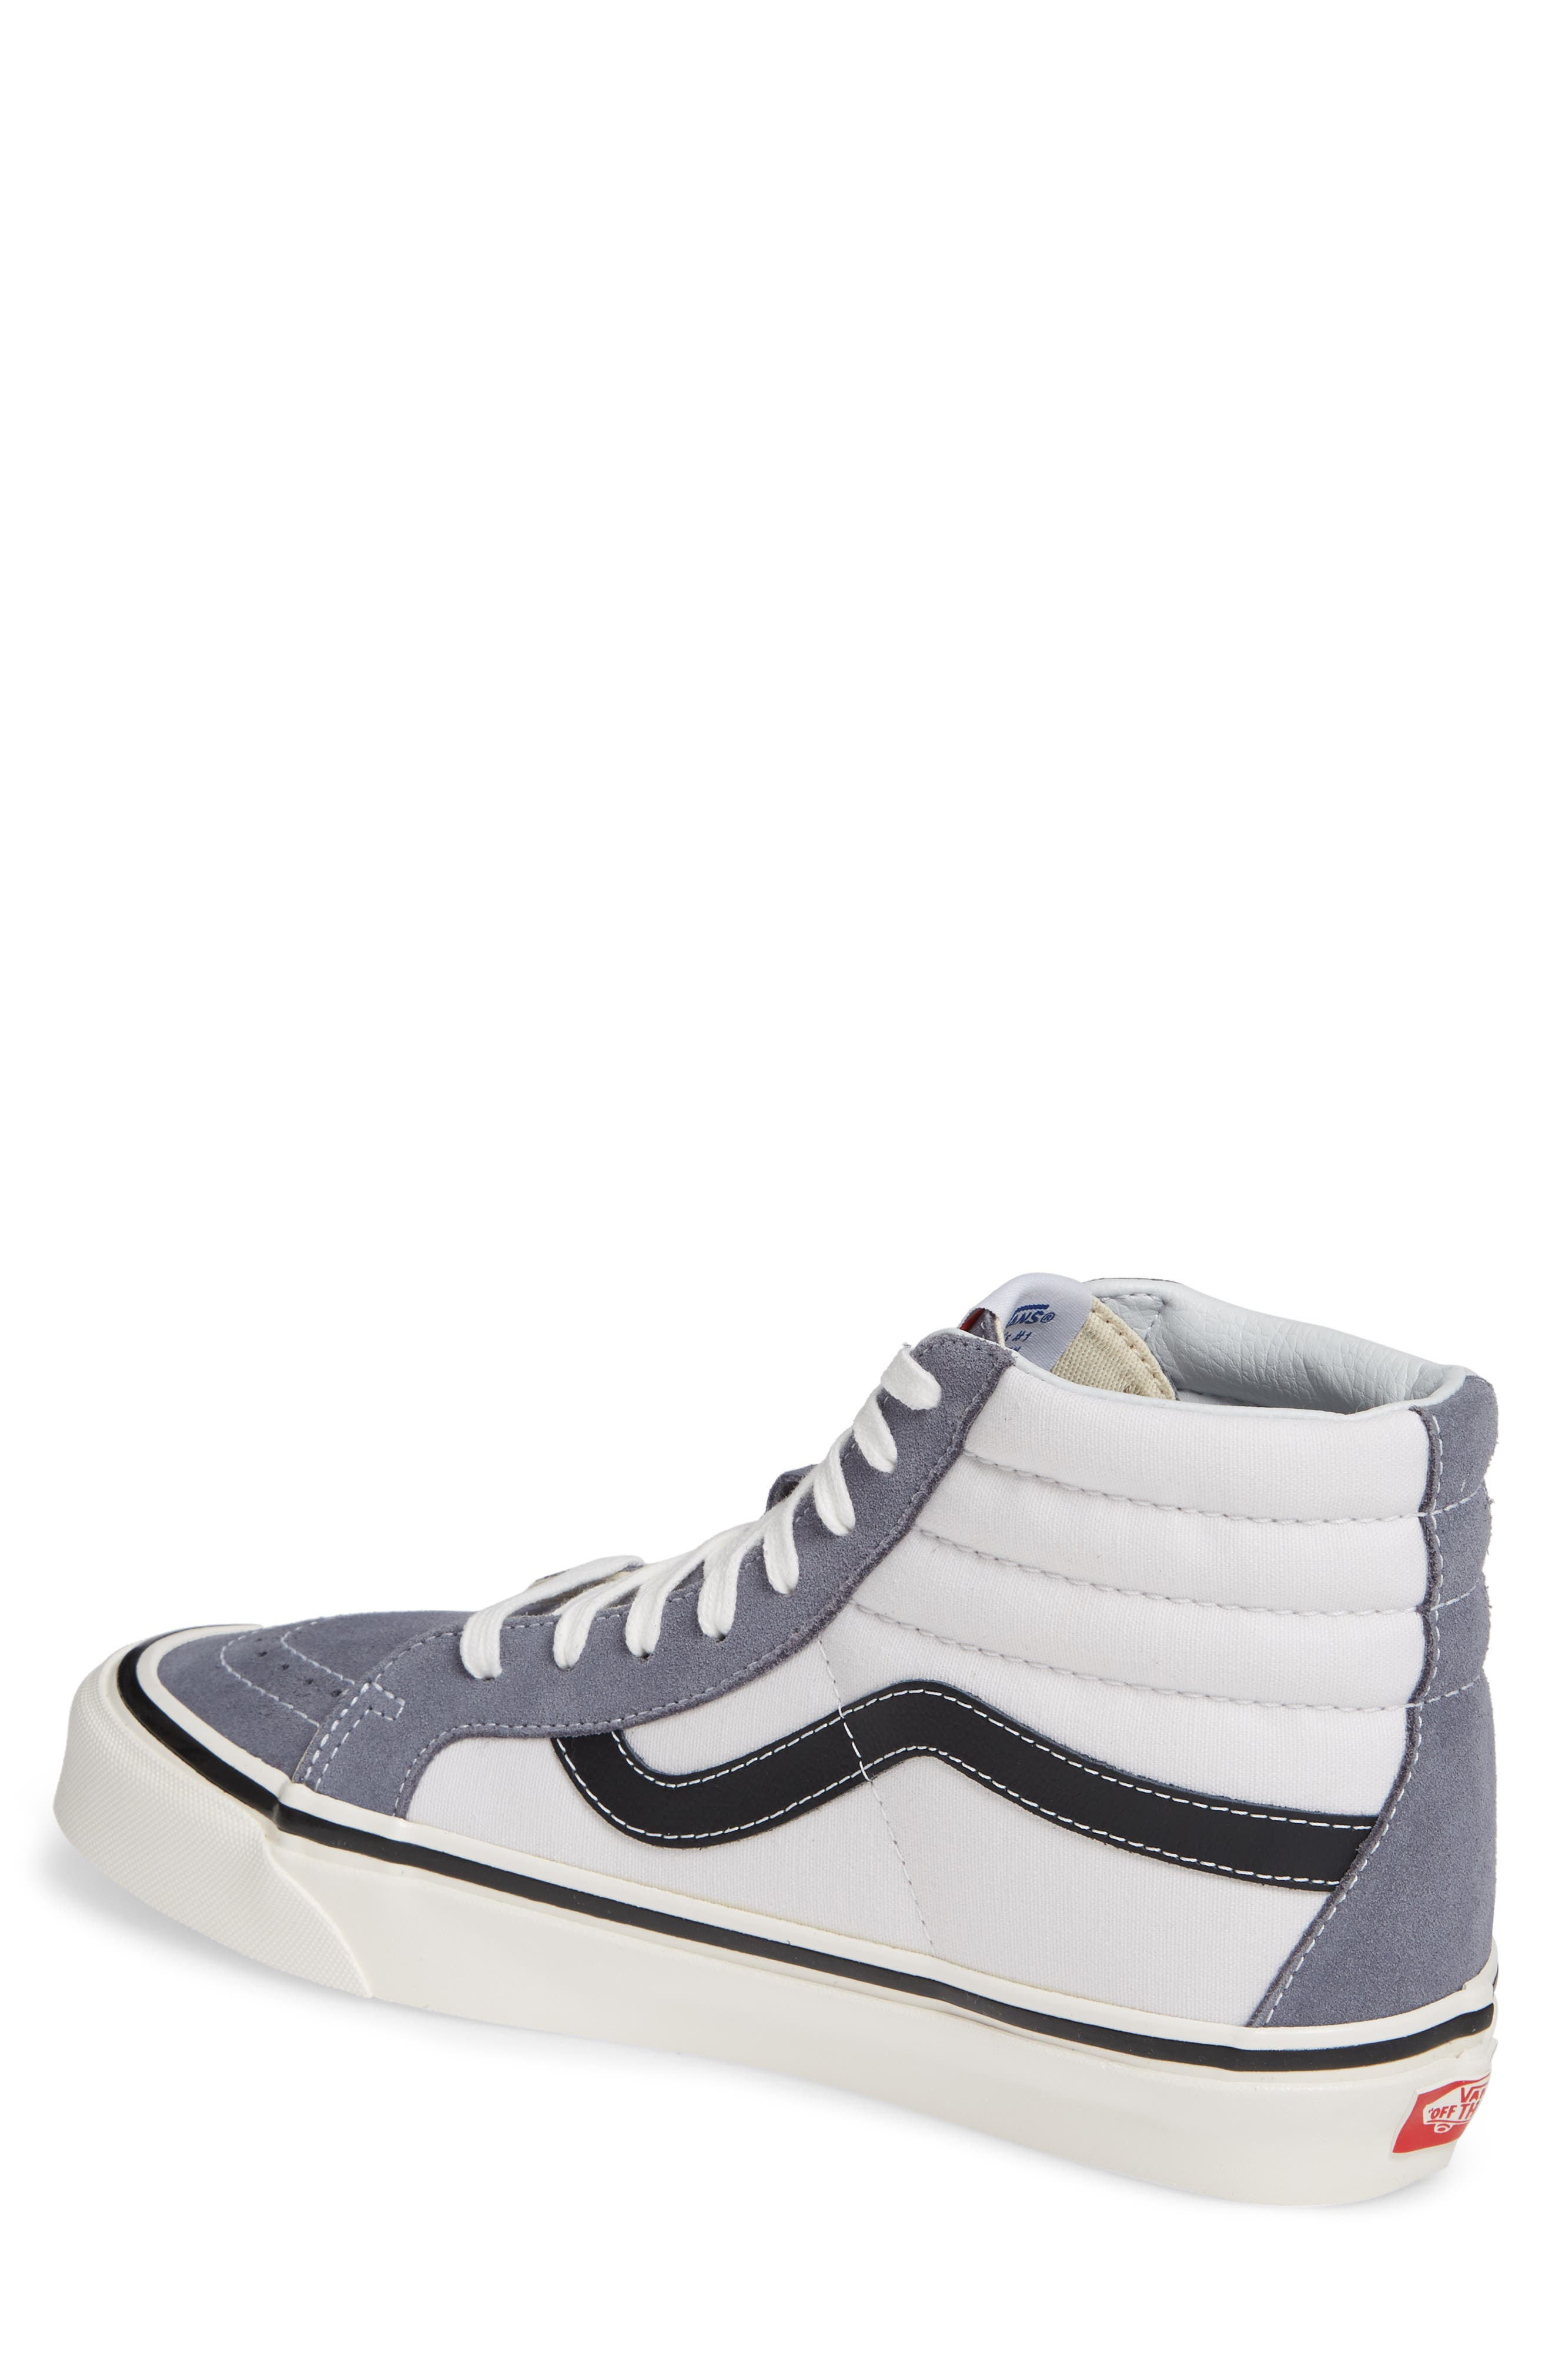 UA Sk8-Hi 38 DX Sneaker,                             Alternate thumbnail 2, color,                             DARK GREY/ WHITE